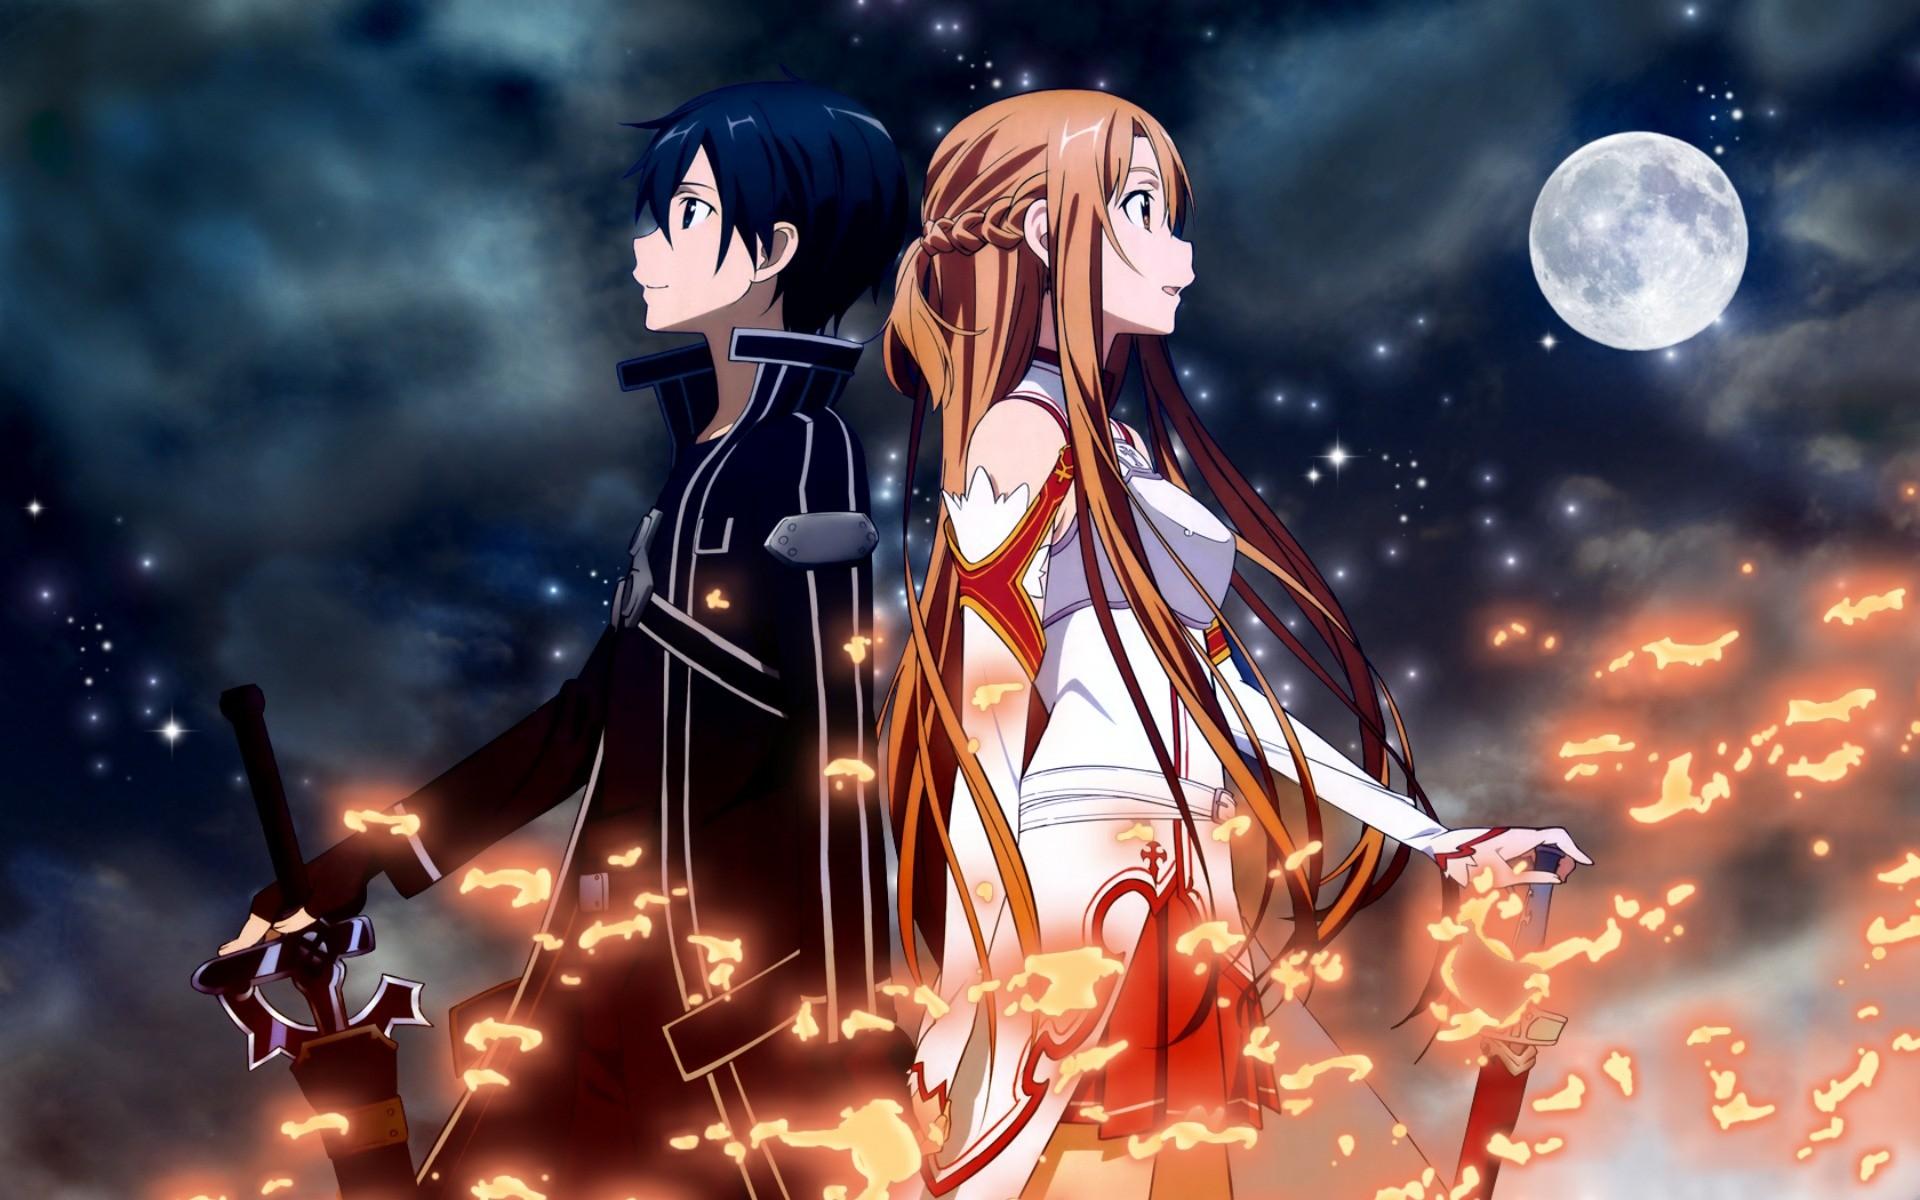 Love Japanese Animation